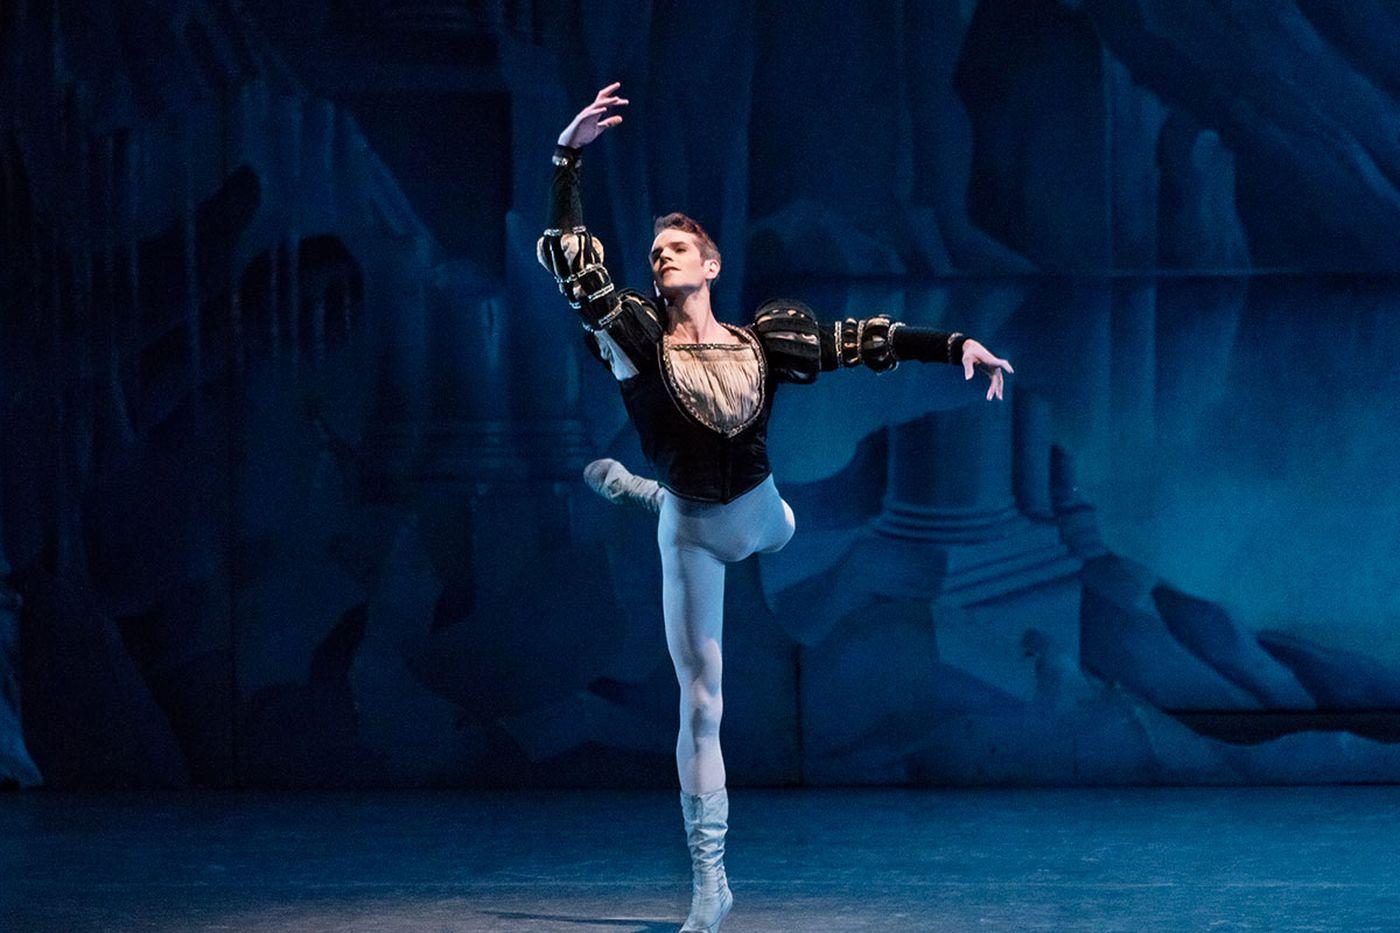 Wyndmoor's Janzen named principal dancer at New York City Ballet